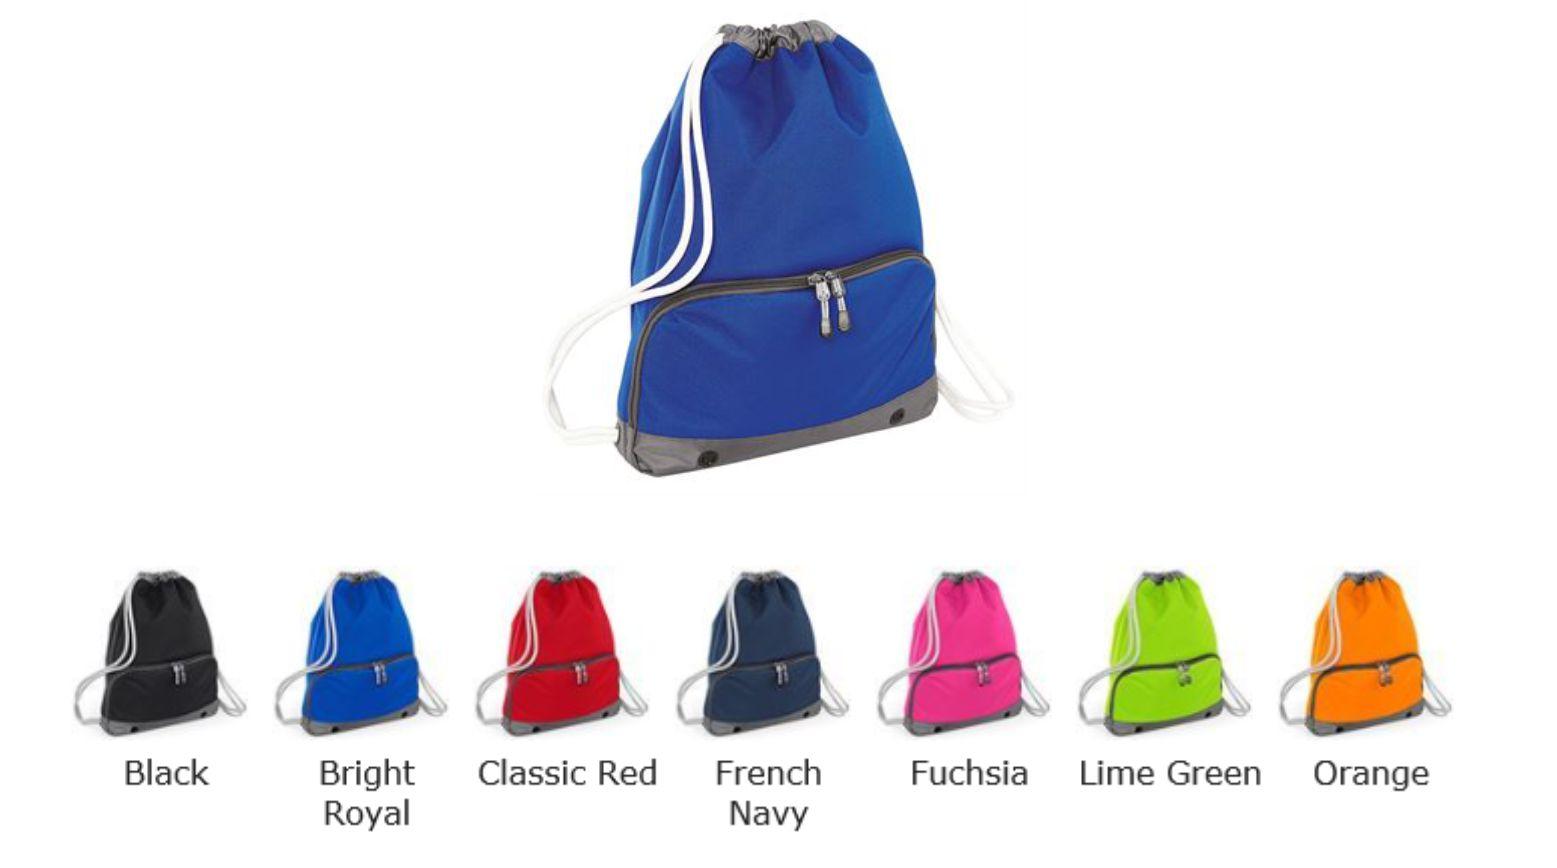 BG542 Bagbase Athleisure Gymsac Water Resistant Drawstring Trainers Gym Bag